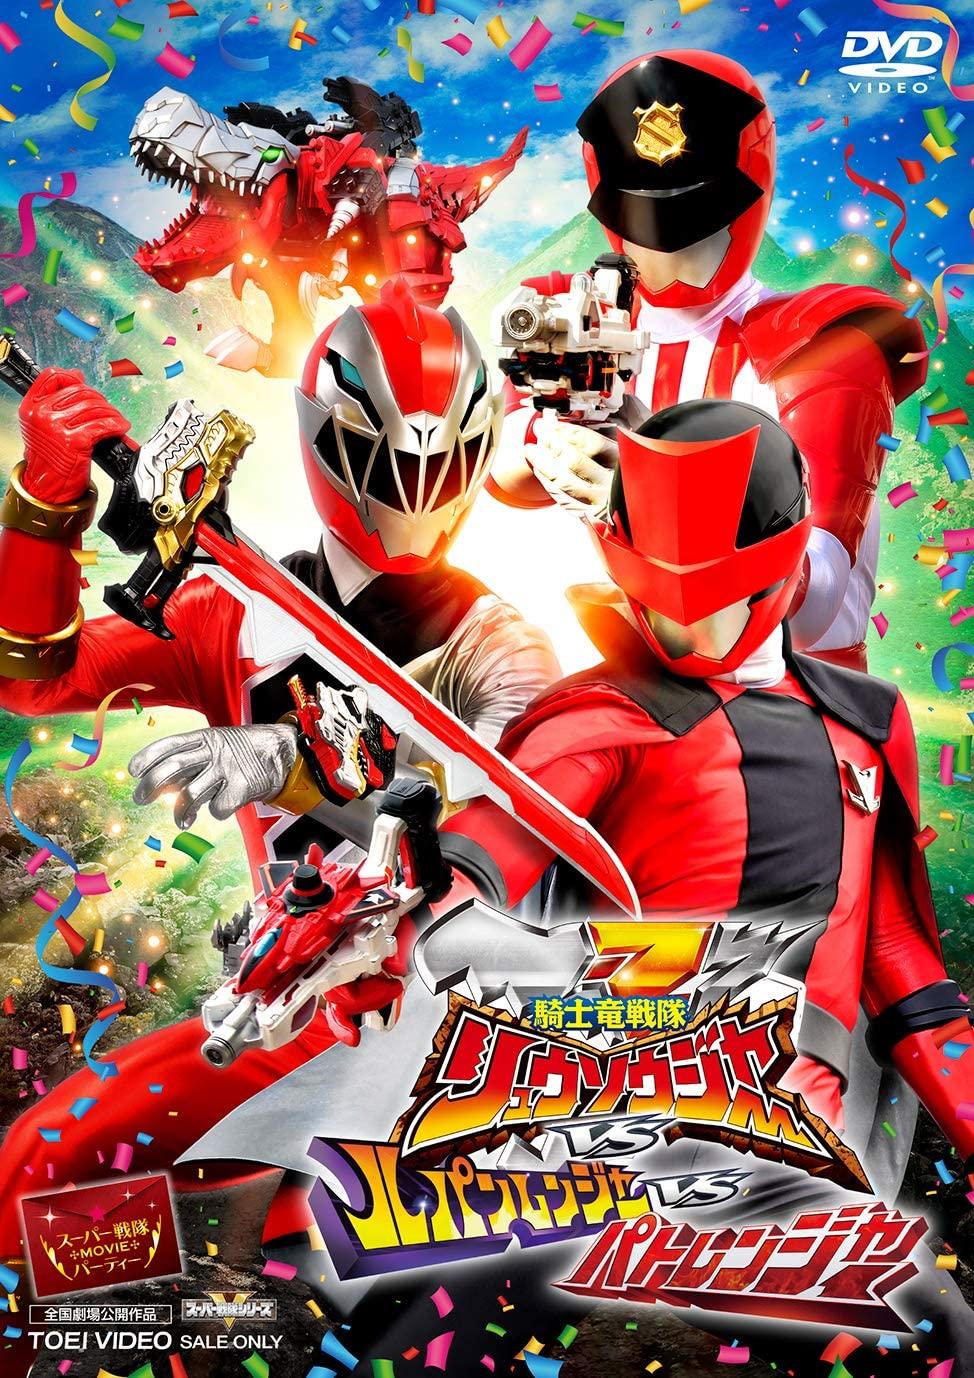 Kishiryu Sentai Ryusoulger VS Lupinranger VS Patranger Subtitle Indonesia